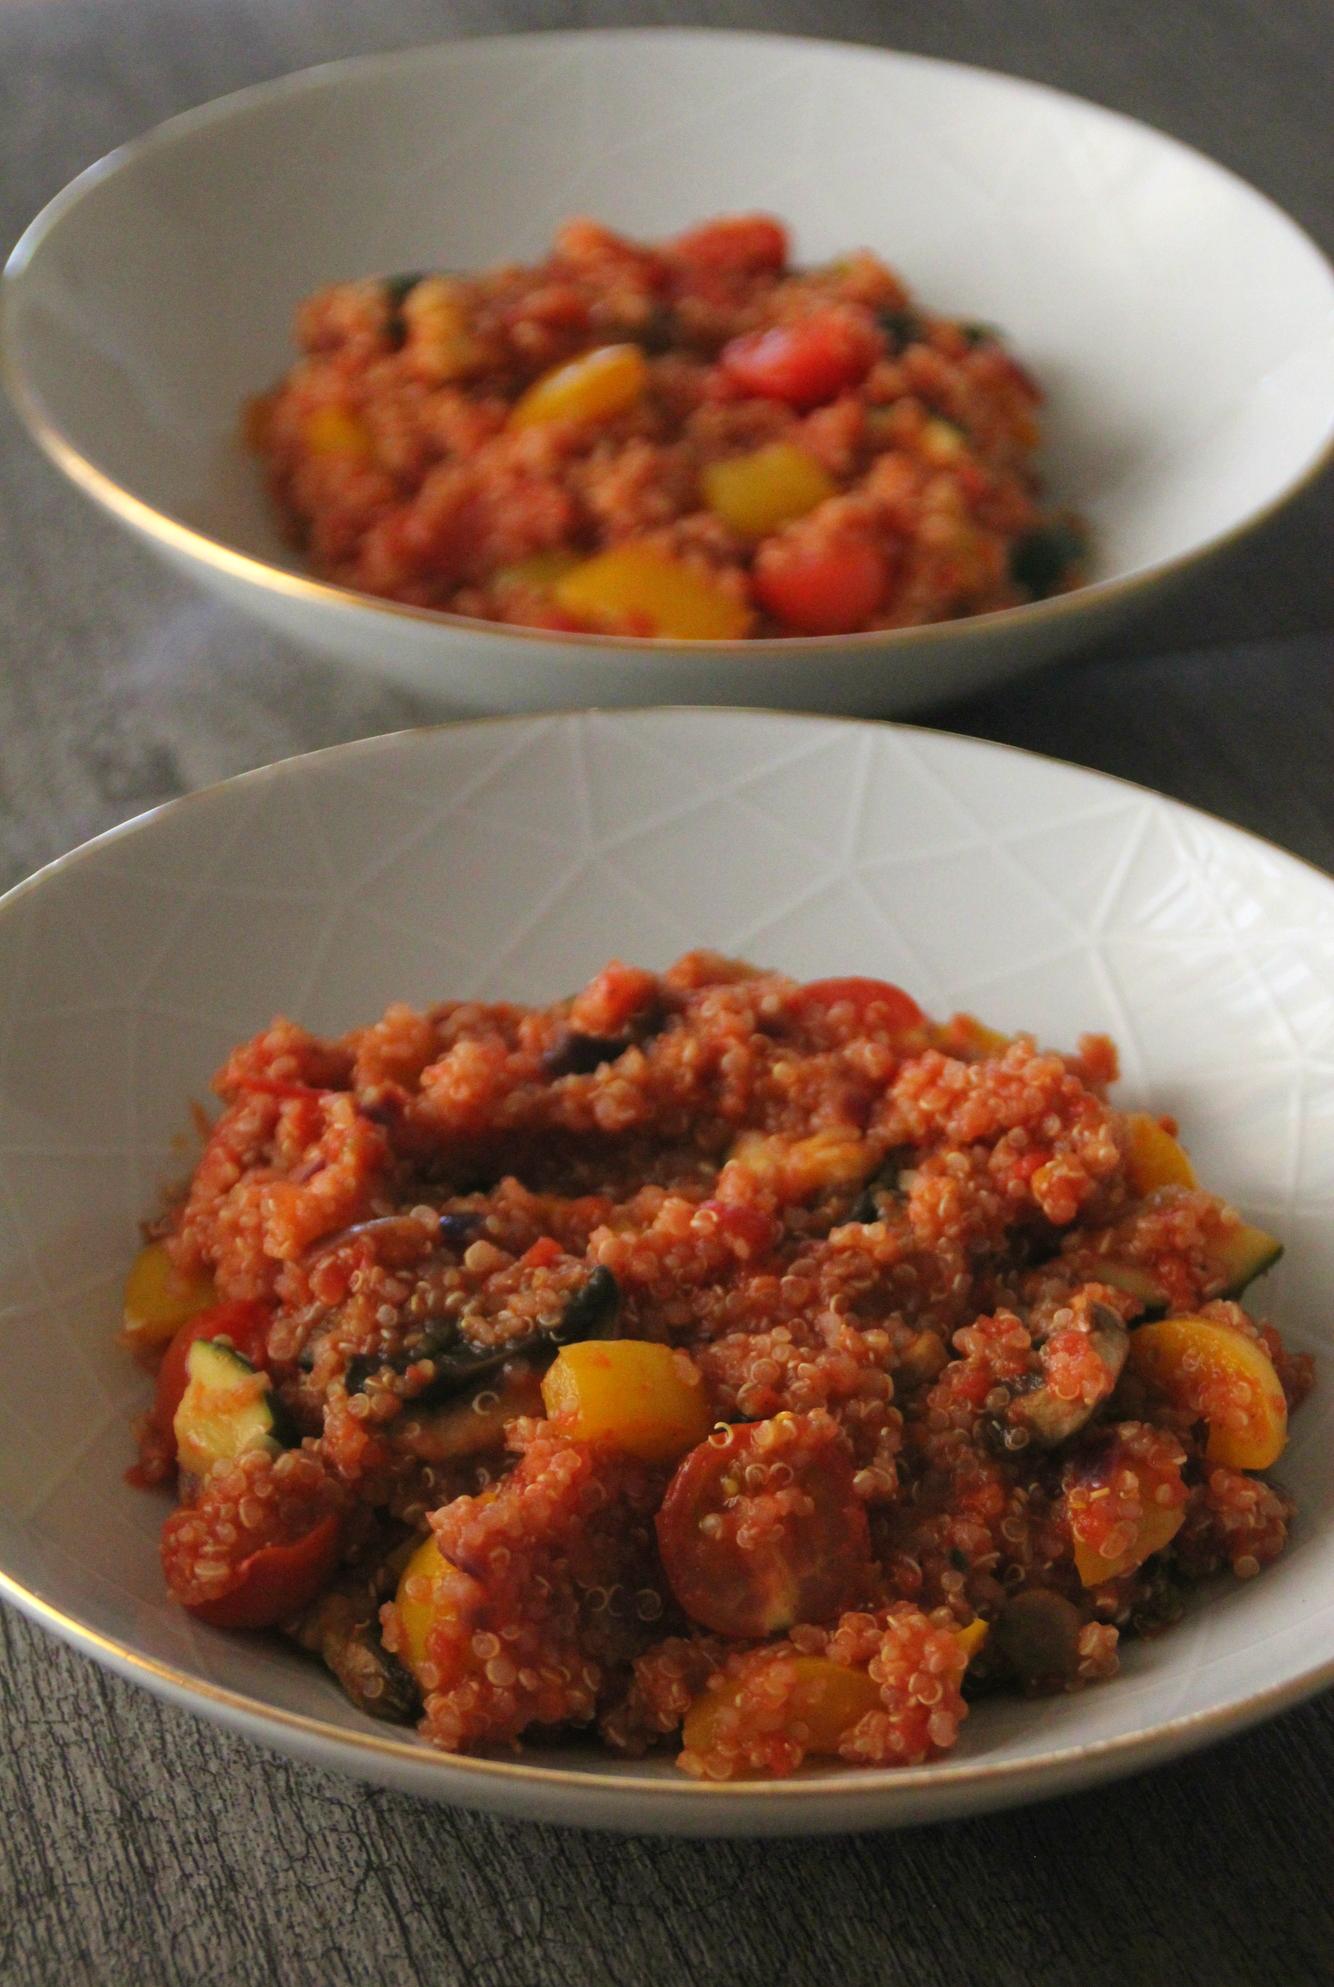 Nopea kasvis-kvinoa